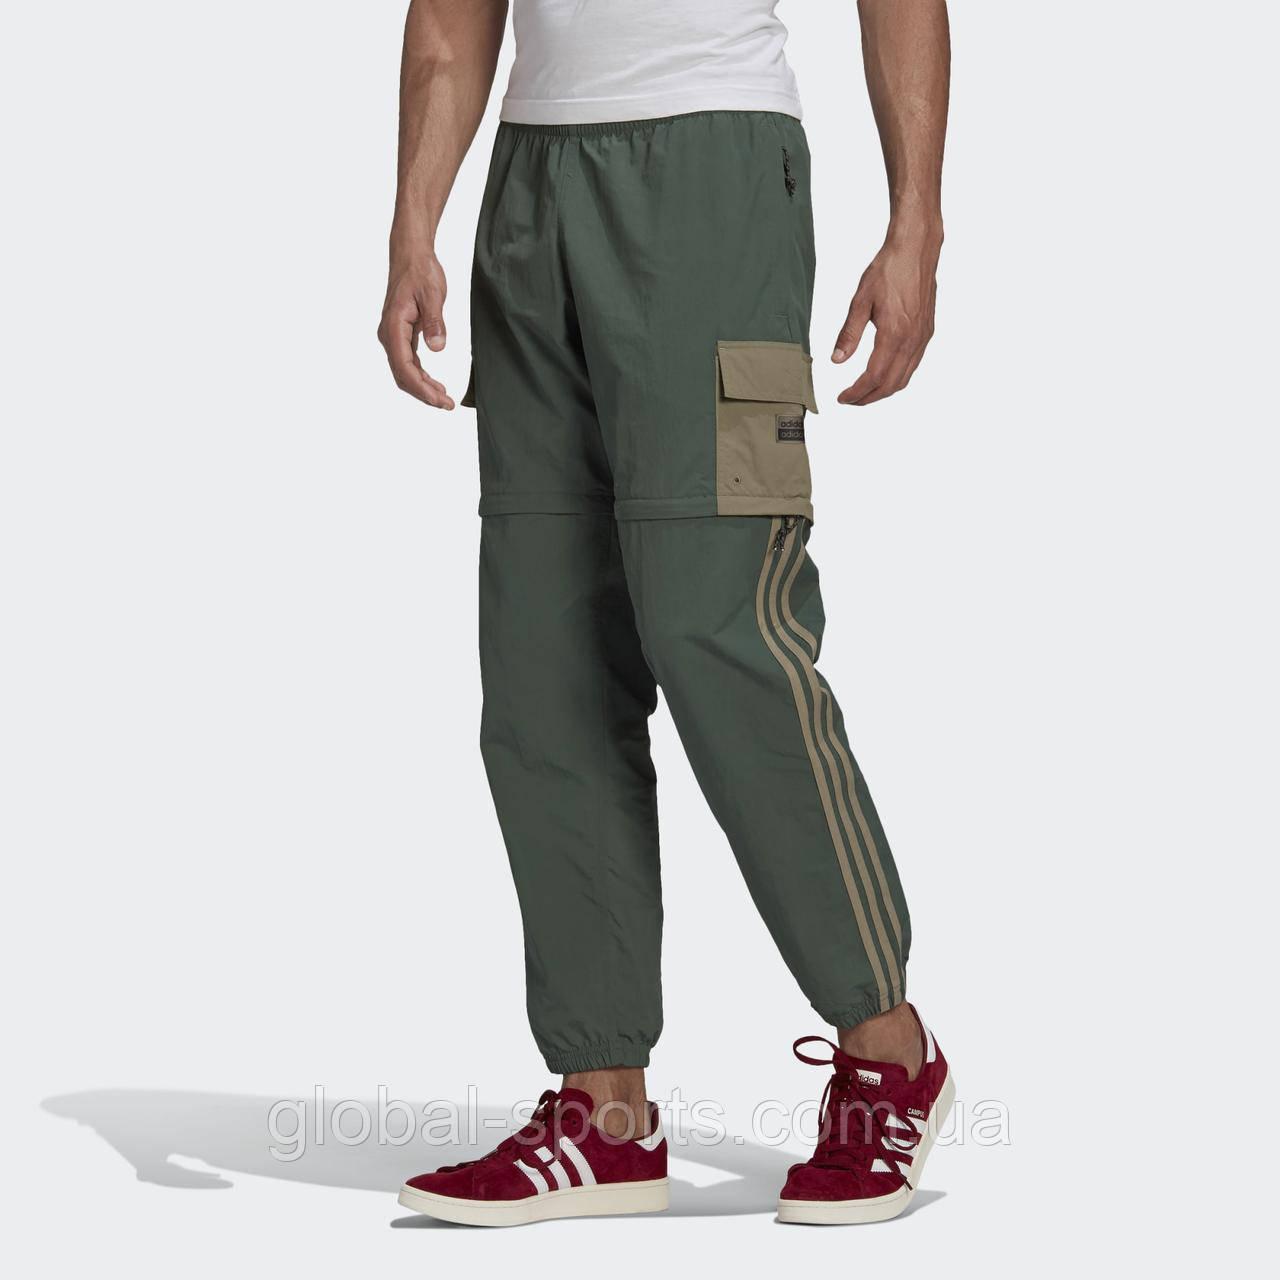 Мужские брюки Adidas R.Y.V. Utility 2-в-1(Артикул:GN3291)